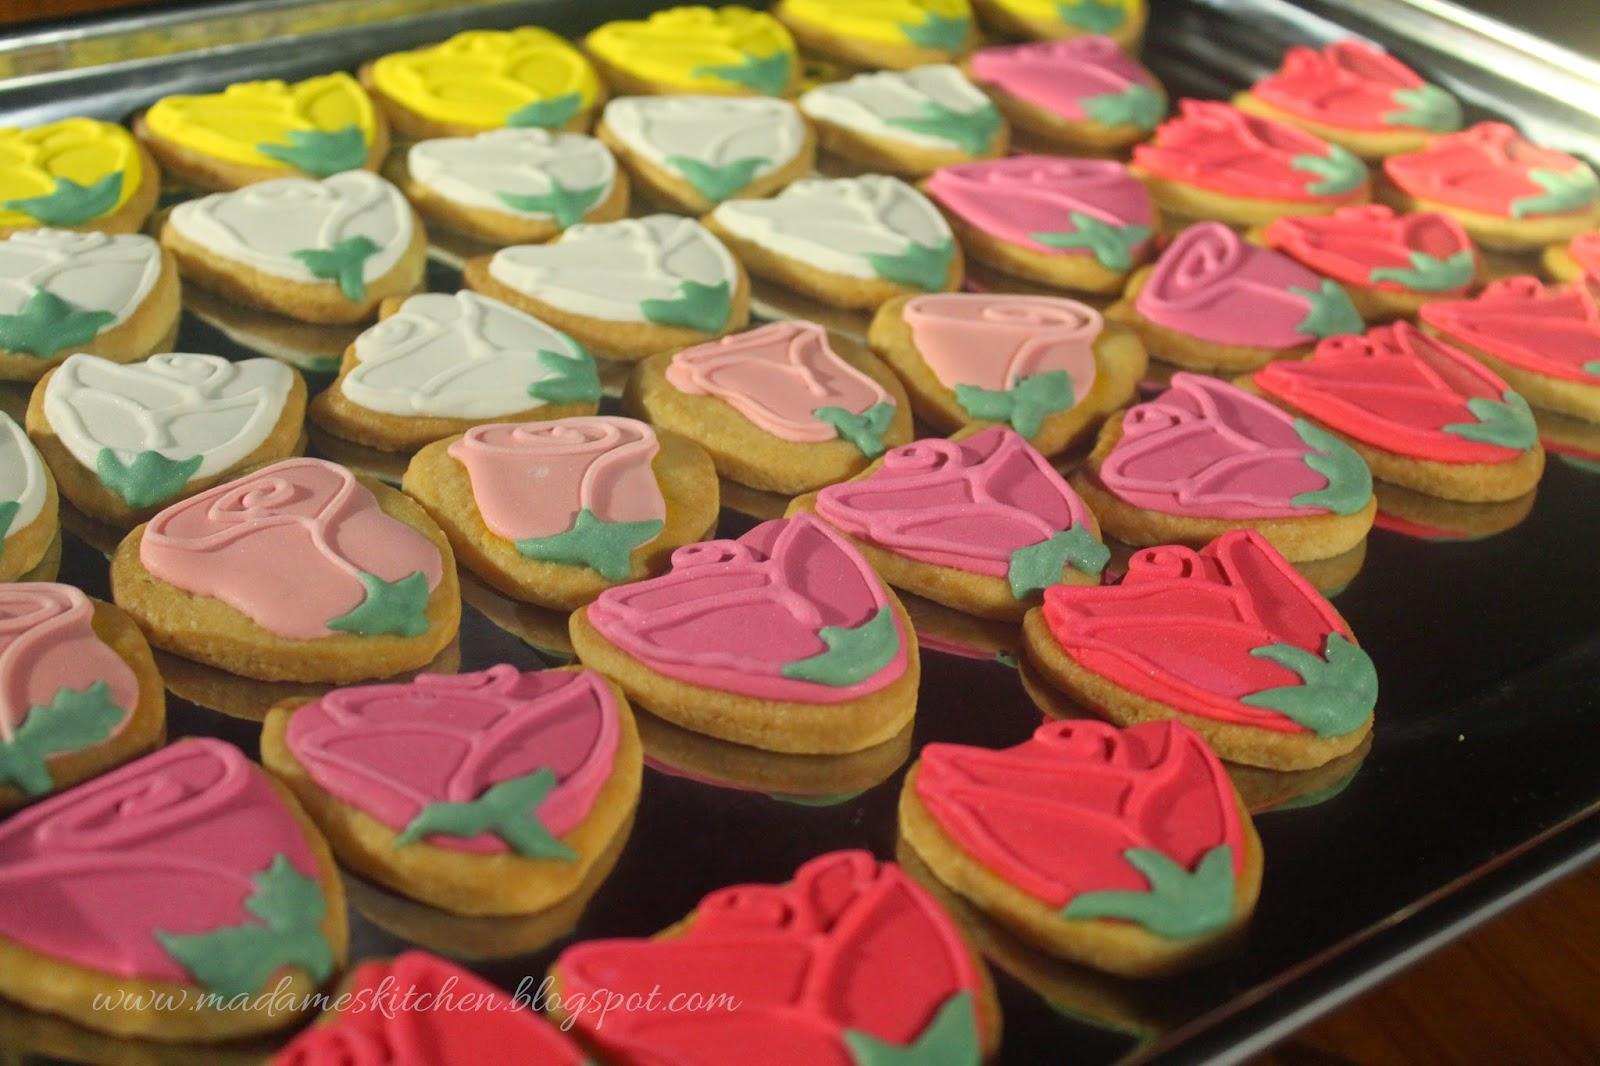 Homemade Kitchen Bouquet Recipe